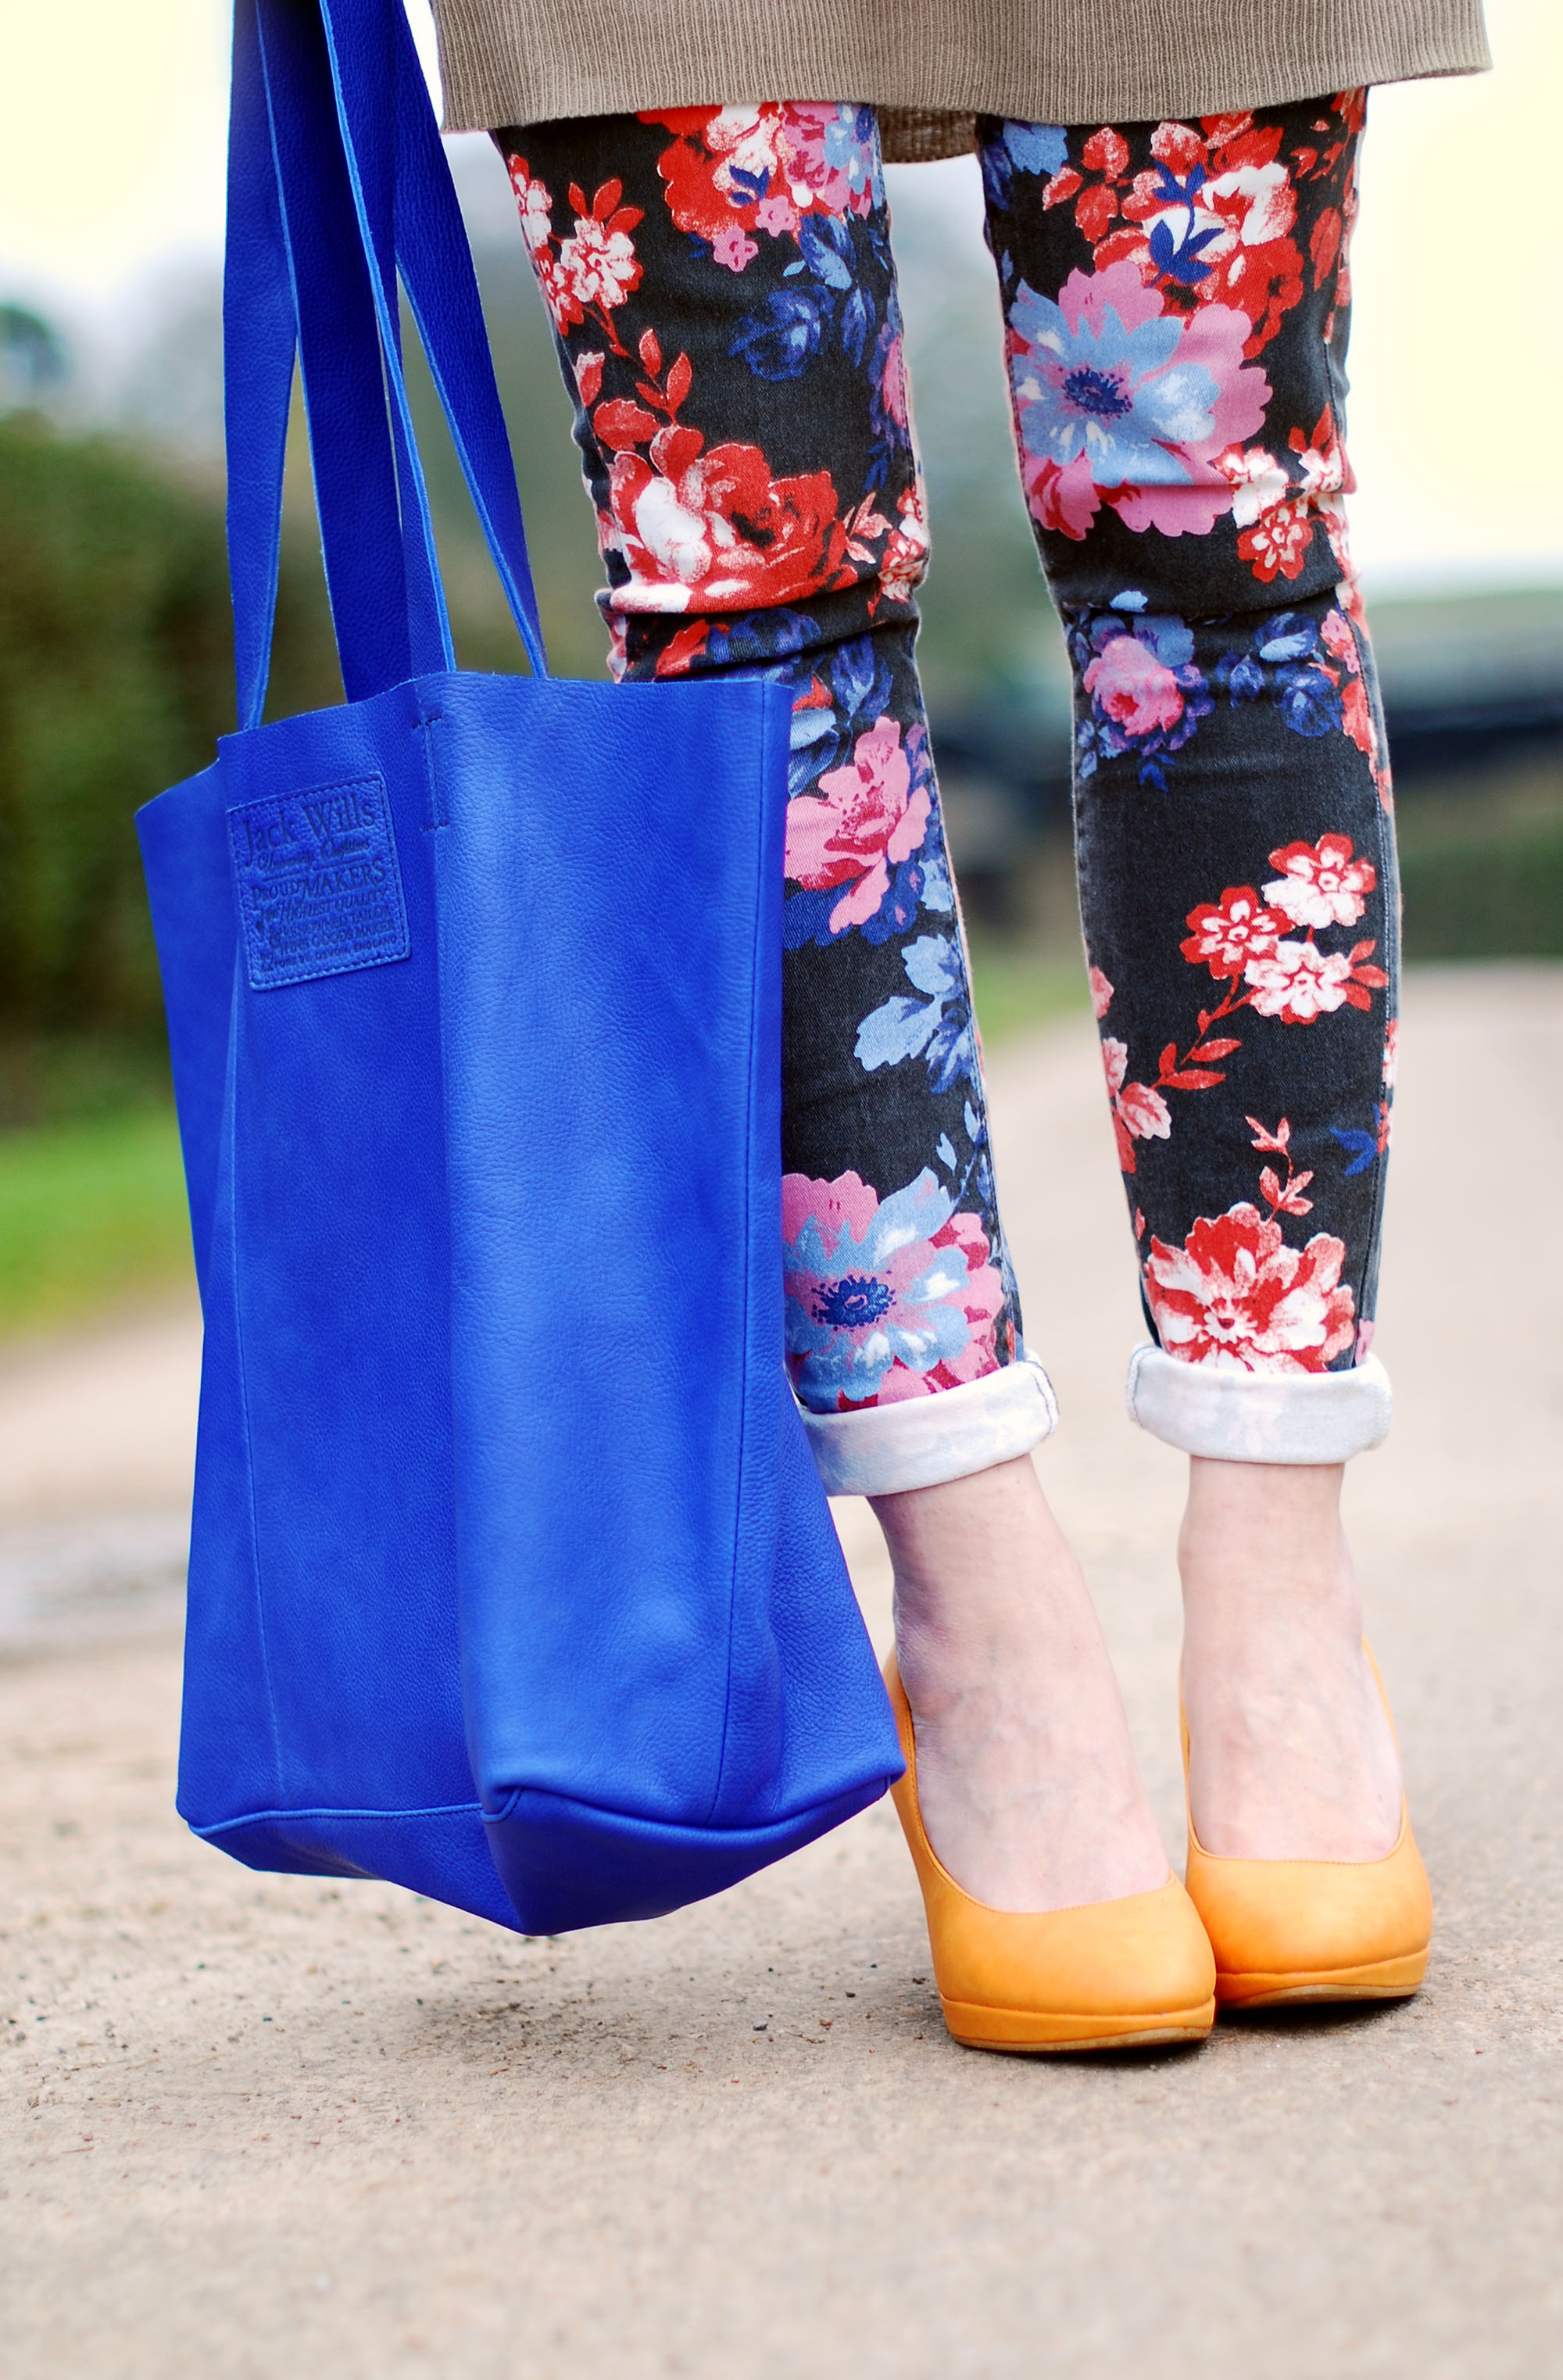 Cobalt blue tote, floral jeans & tangerine heels